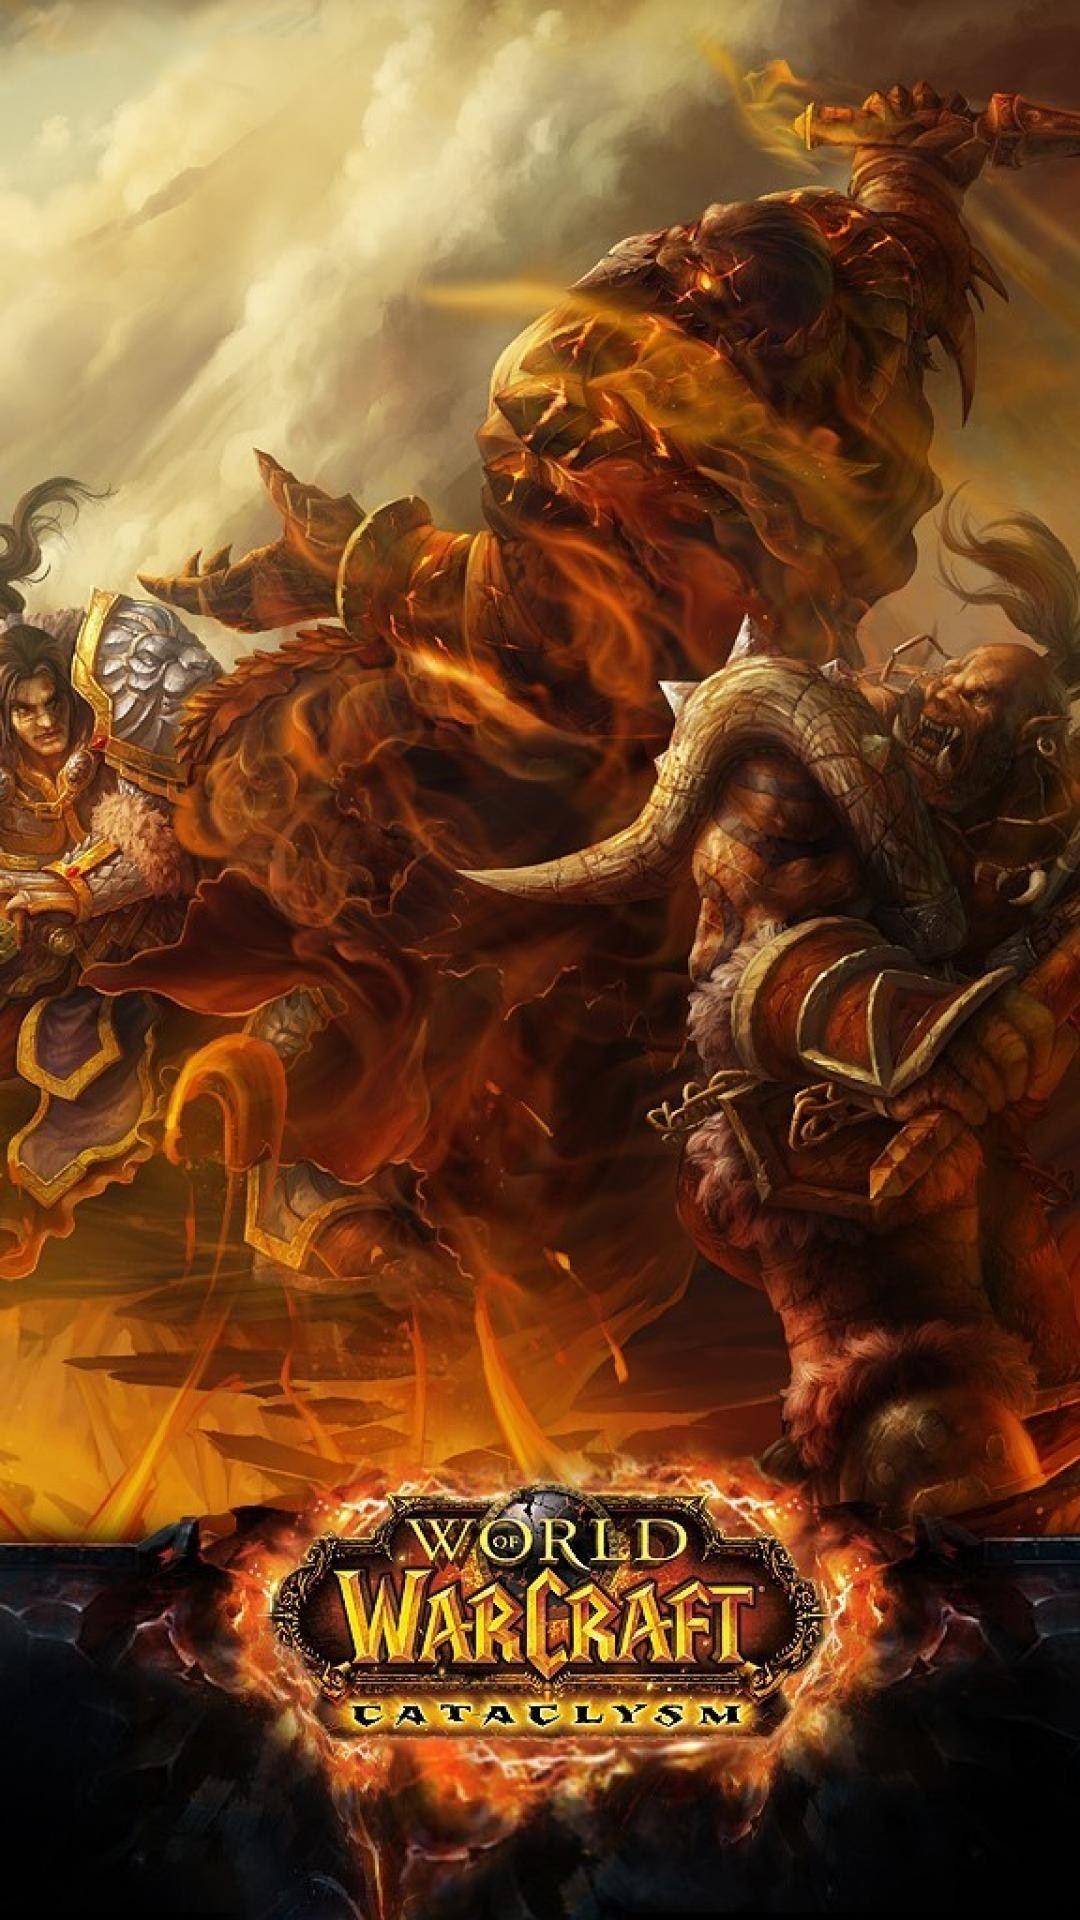 Wow Druid Wallpaper World Of Warcraft 2221980 Hd Wallpaper